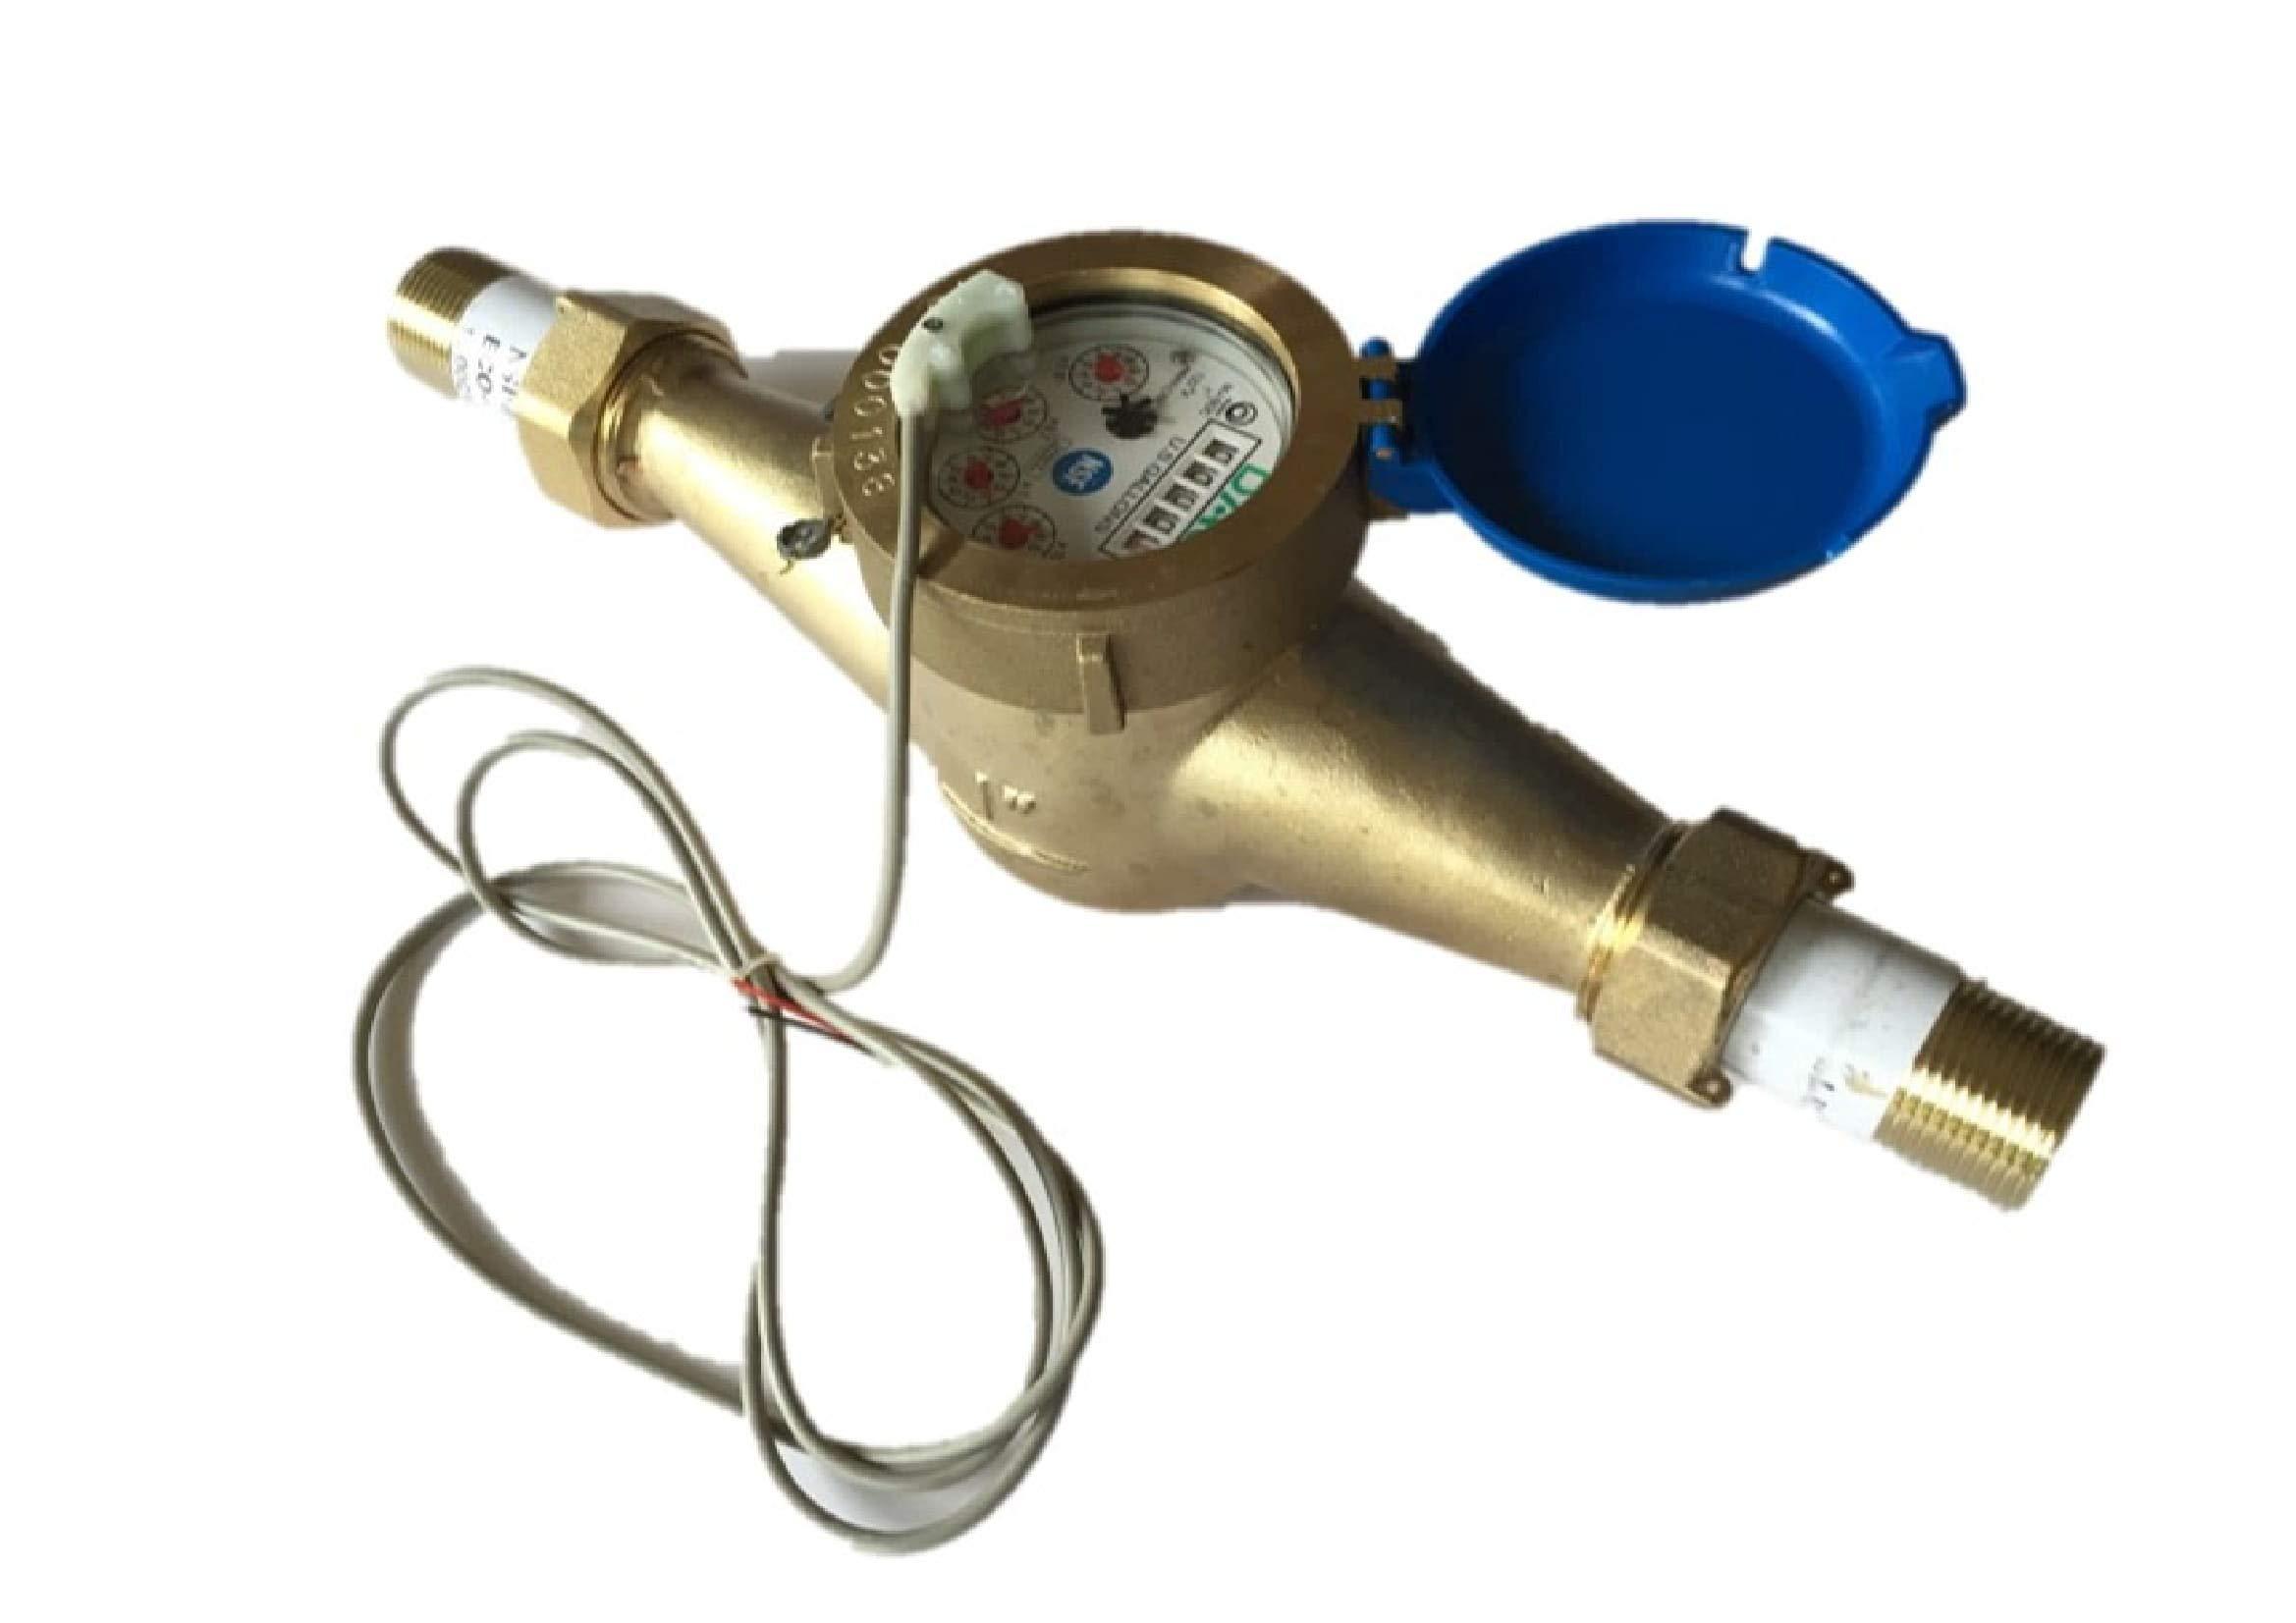 DAE MJ-100 1'' NSF61 Lead Free Potable Water Meter, Pulse Output + Couplings by DAE